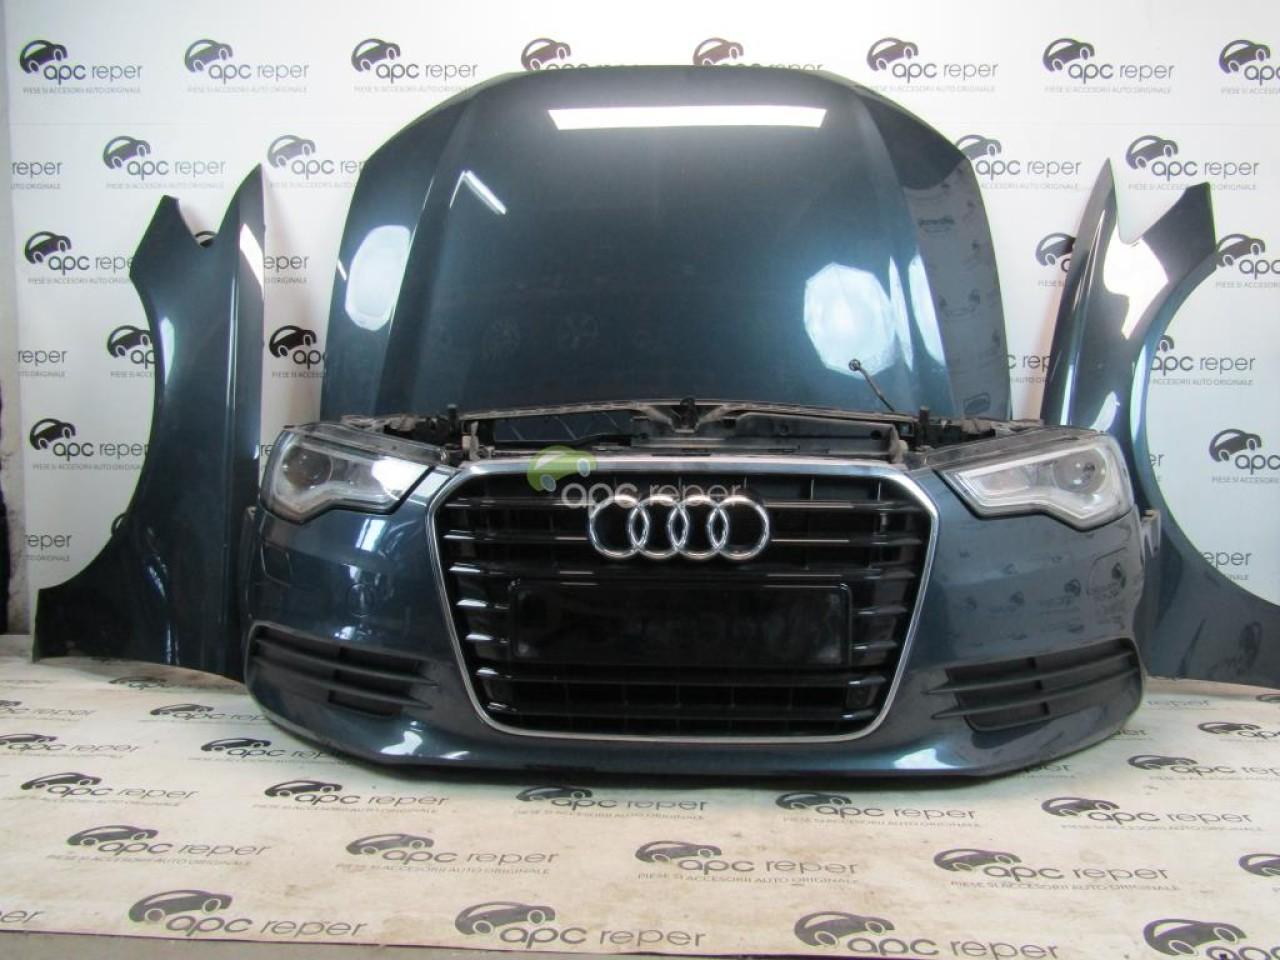 Fata completa Audi A6 4G 2.0tdi an 2011